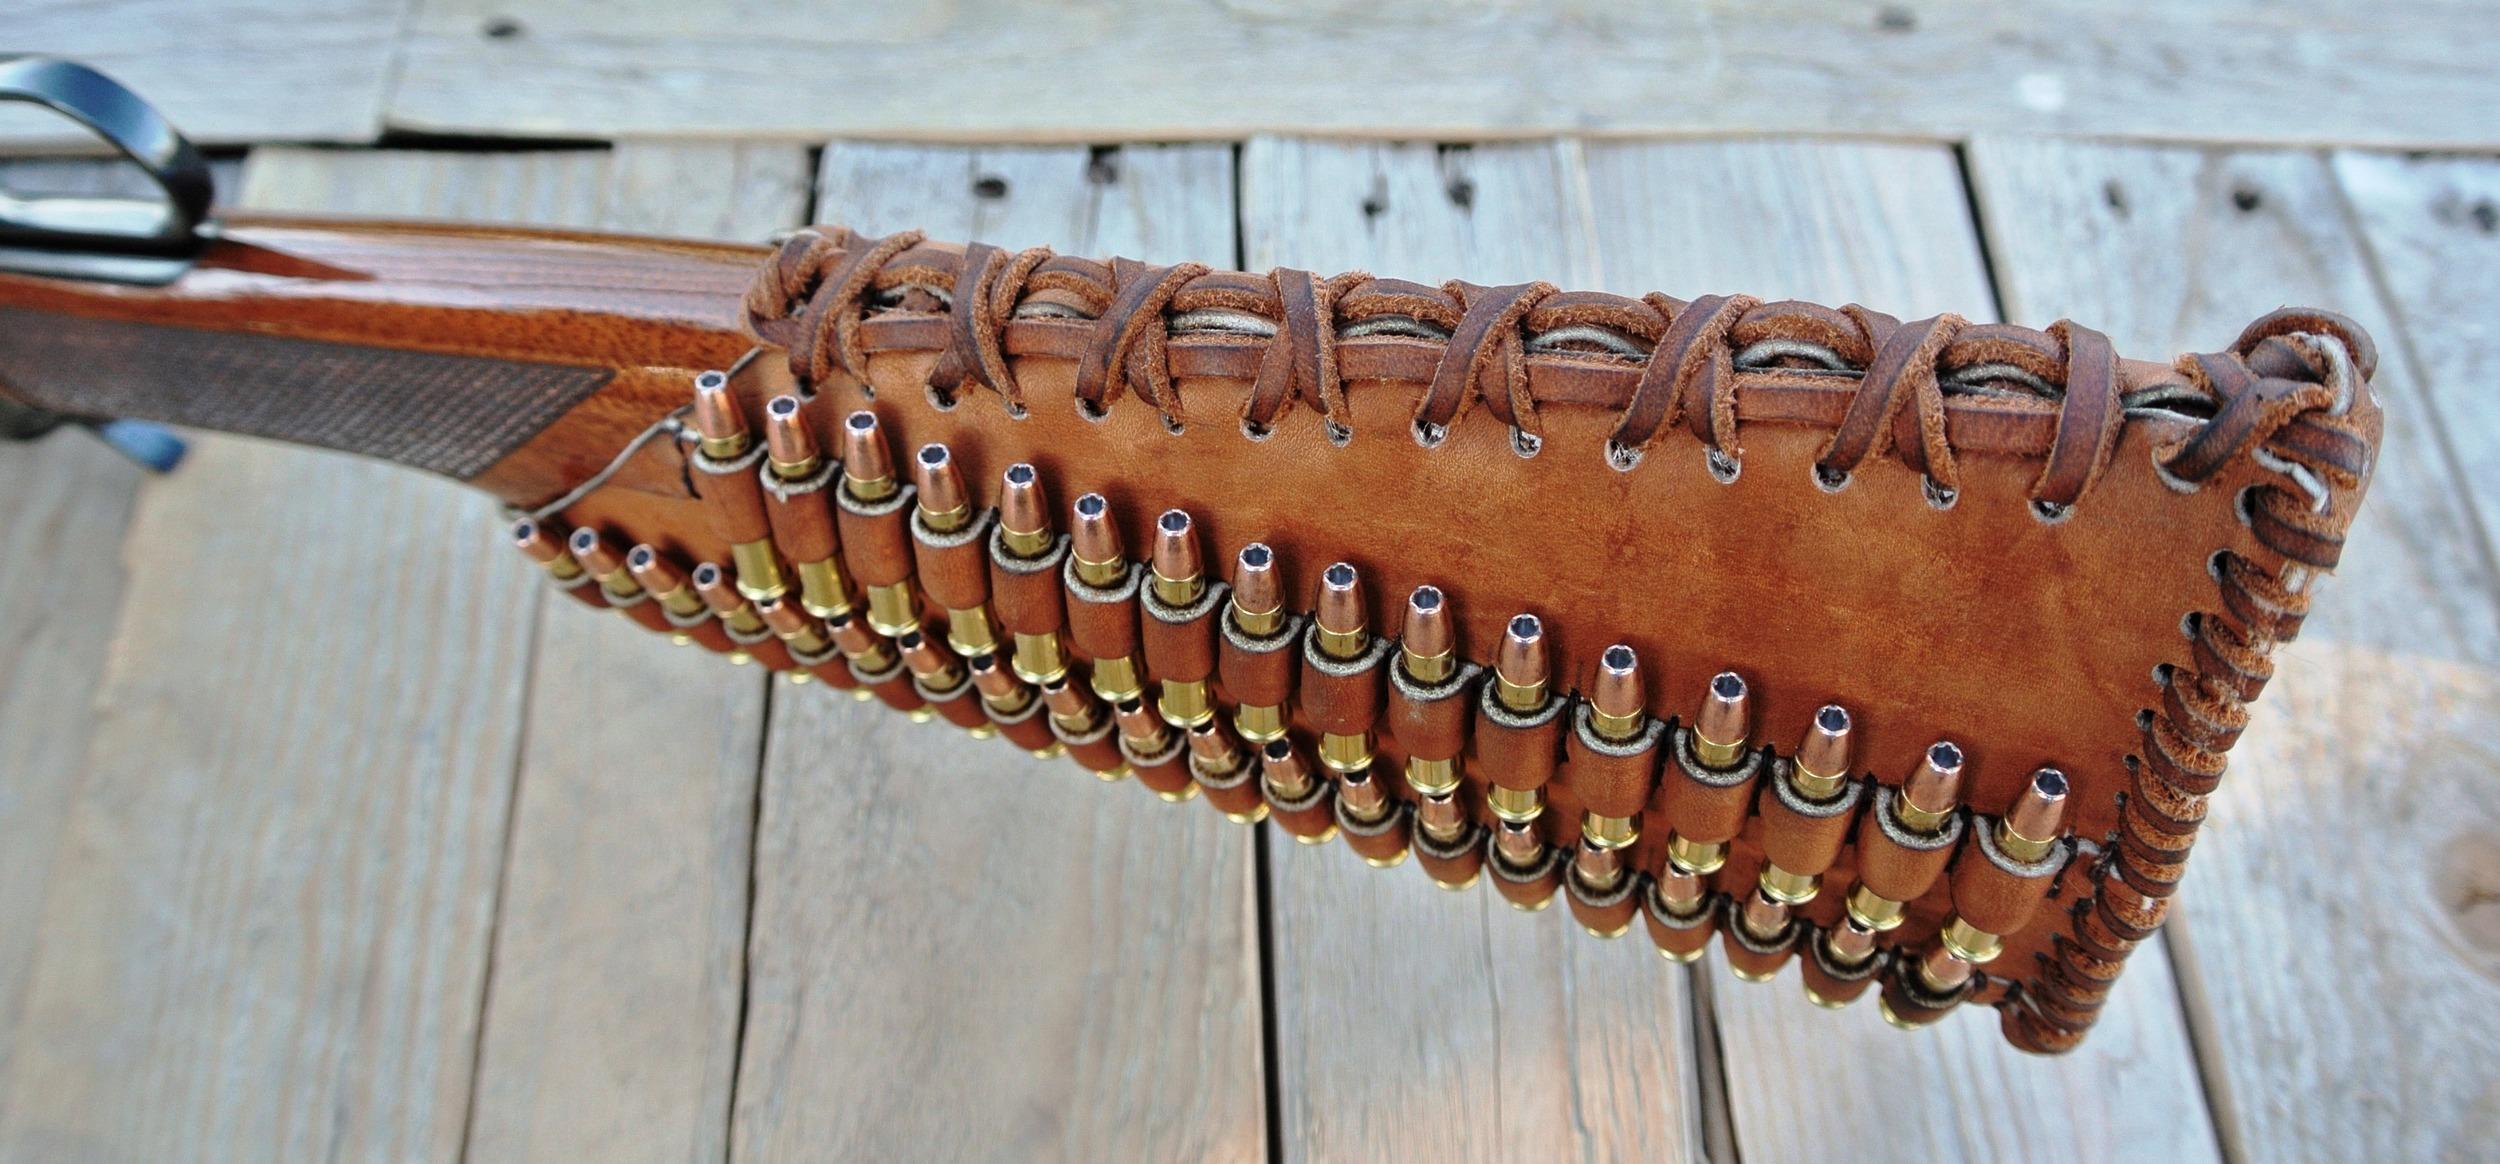 Circle M Brand - .22 Magnum Ammo Holder Buttstock.JPG